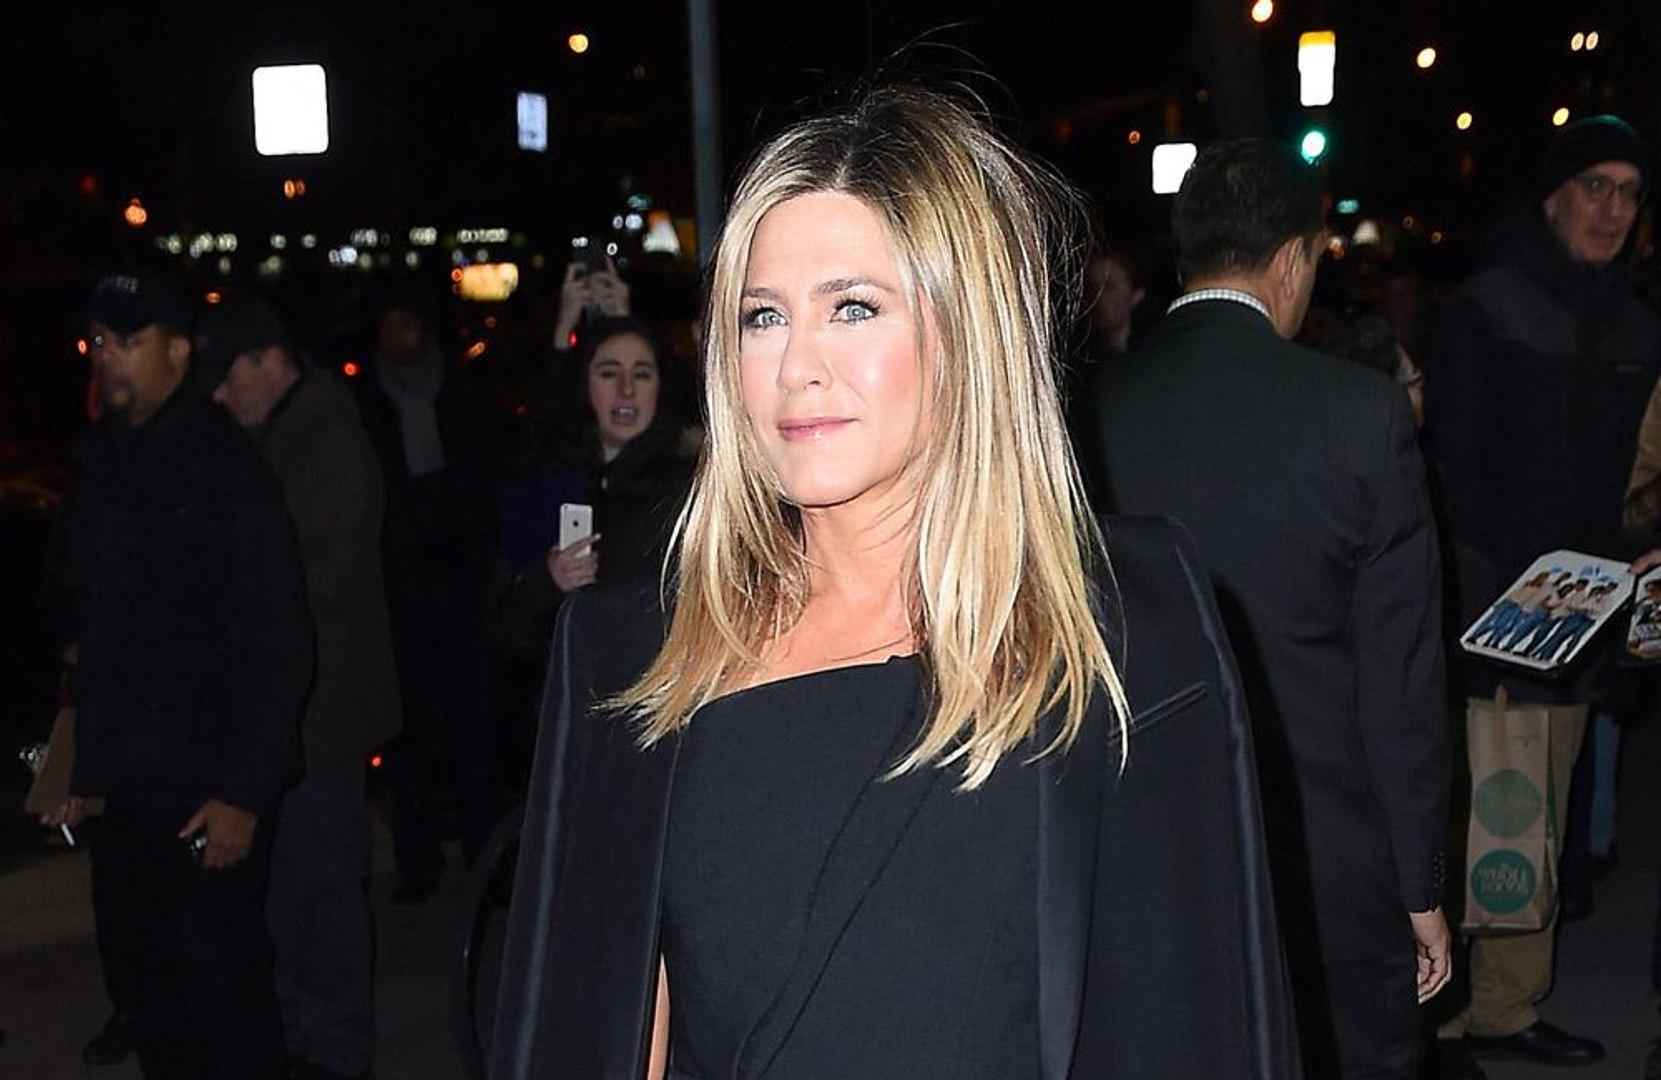 Jennifer Aniston's trusty skincare routine